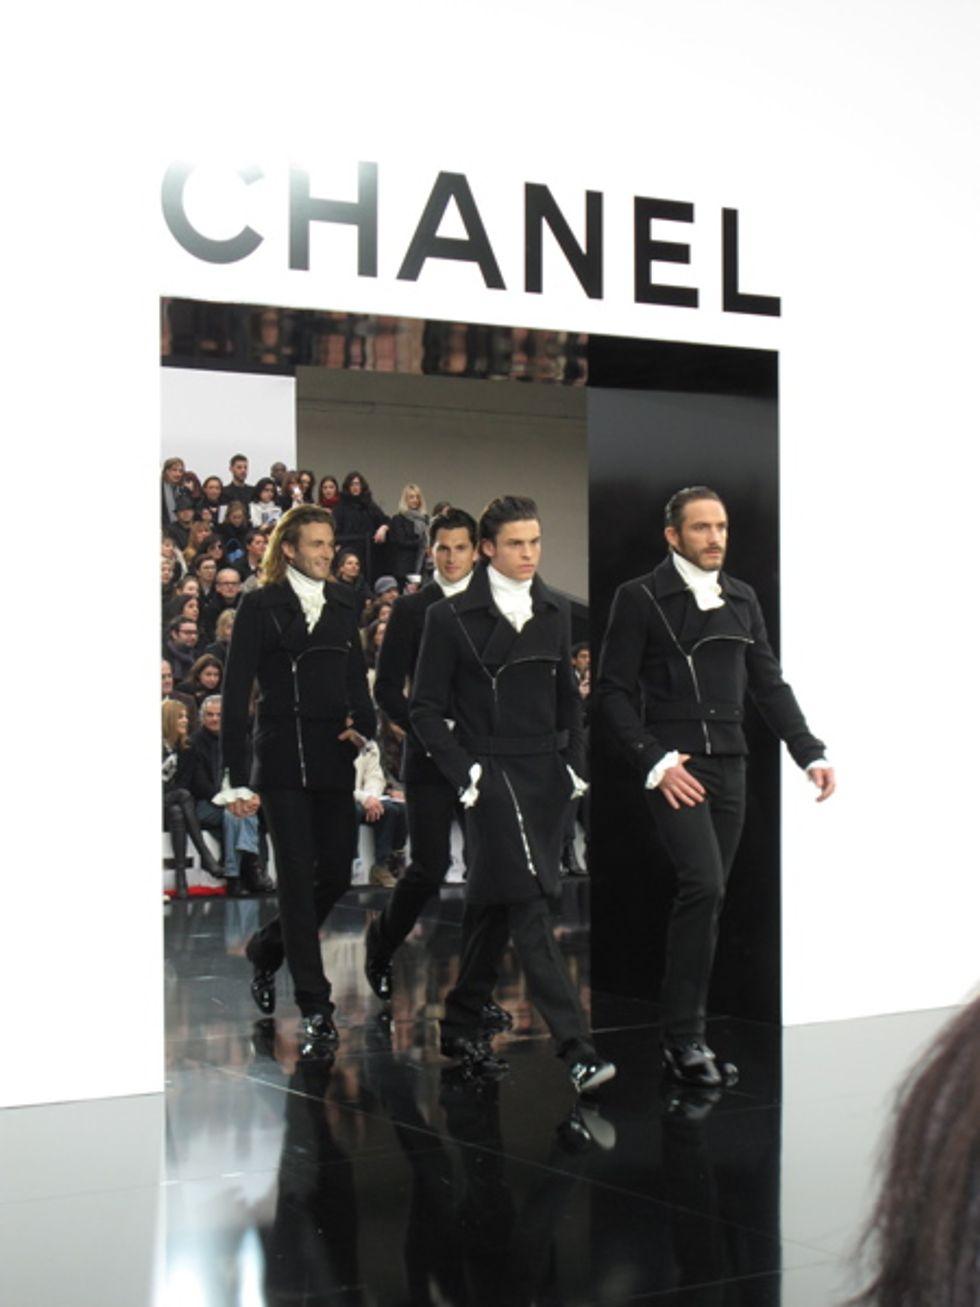 Mr. Mickey Is a Chanel Man